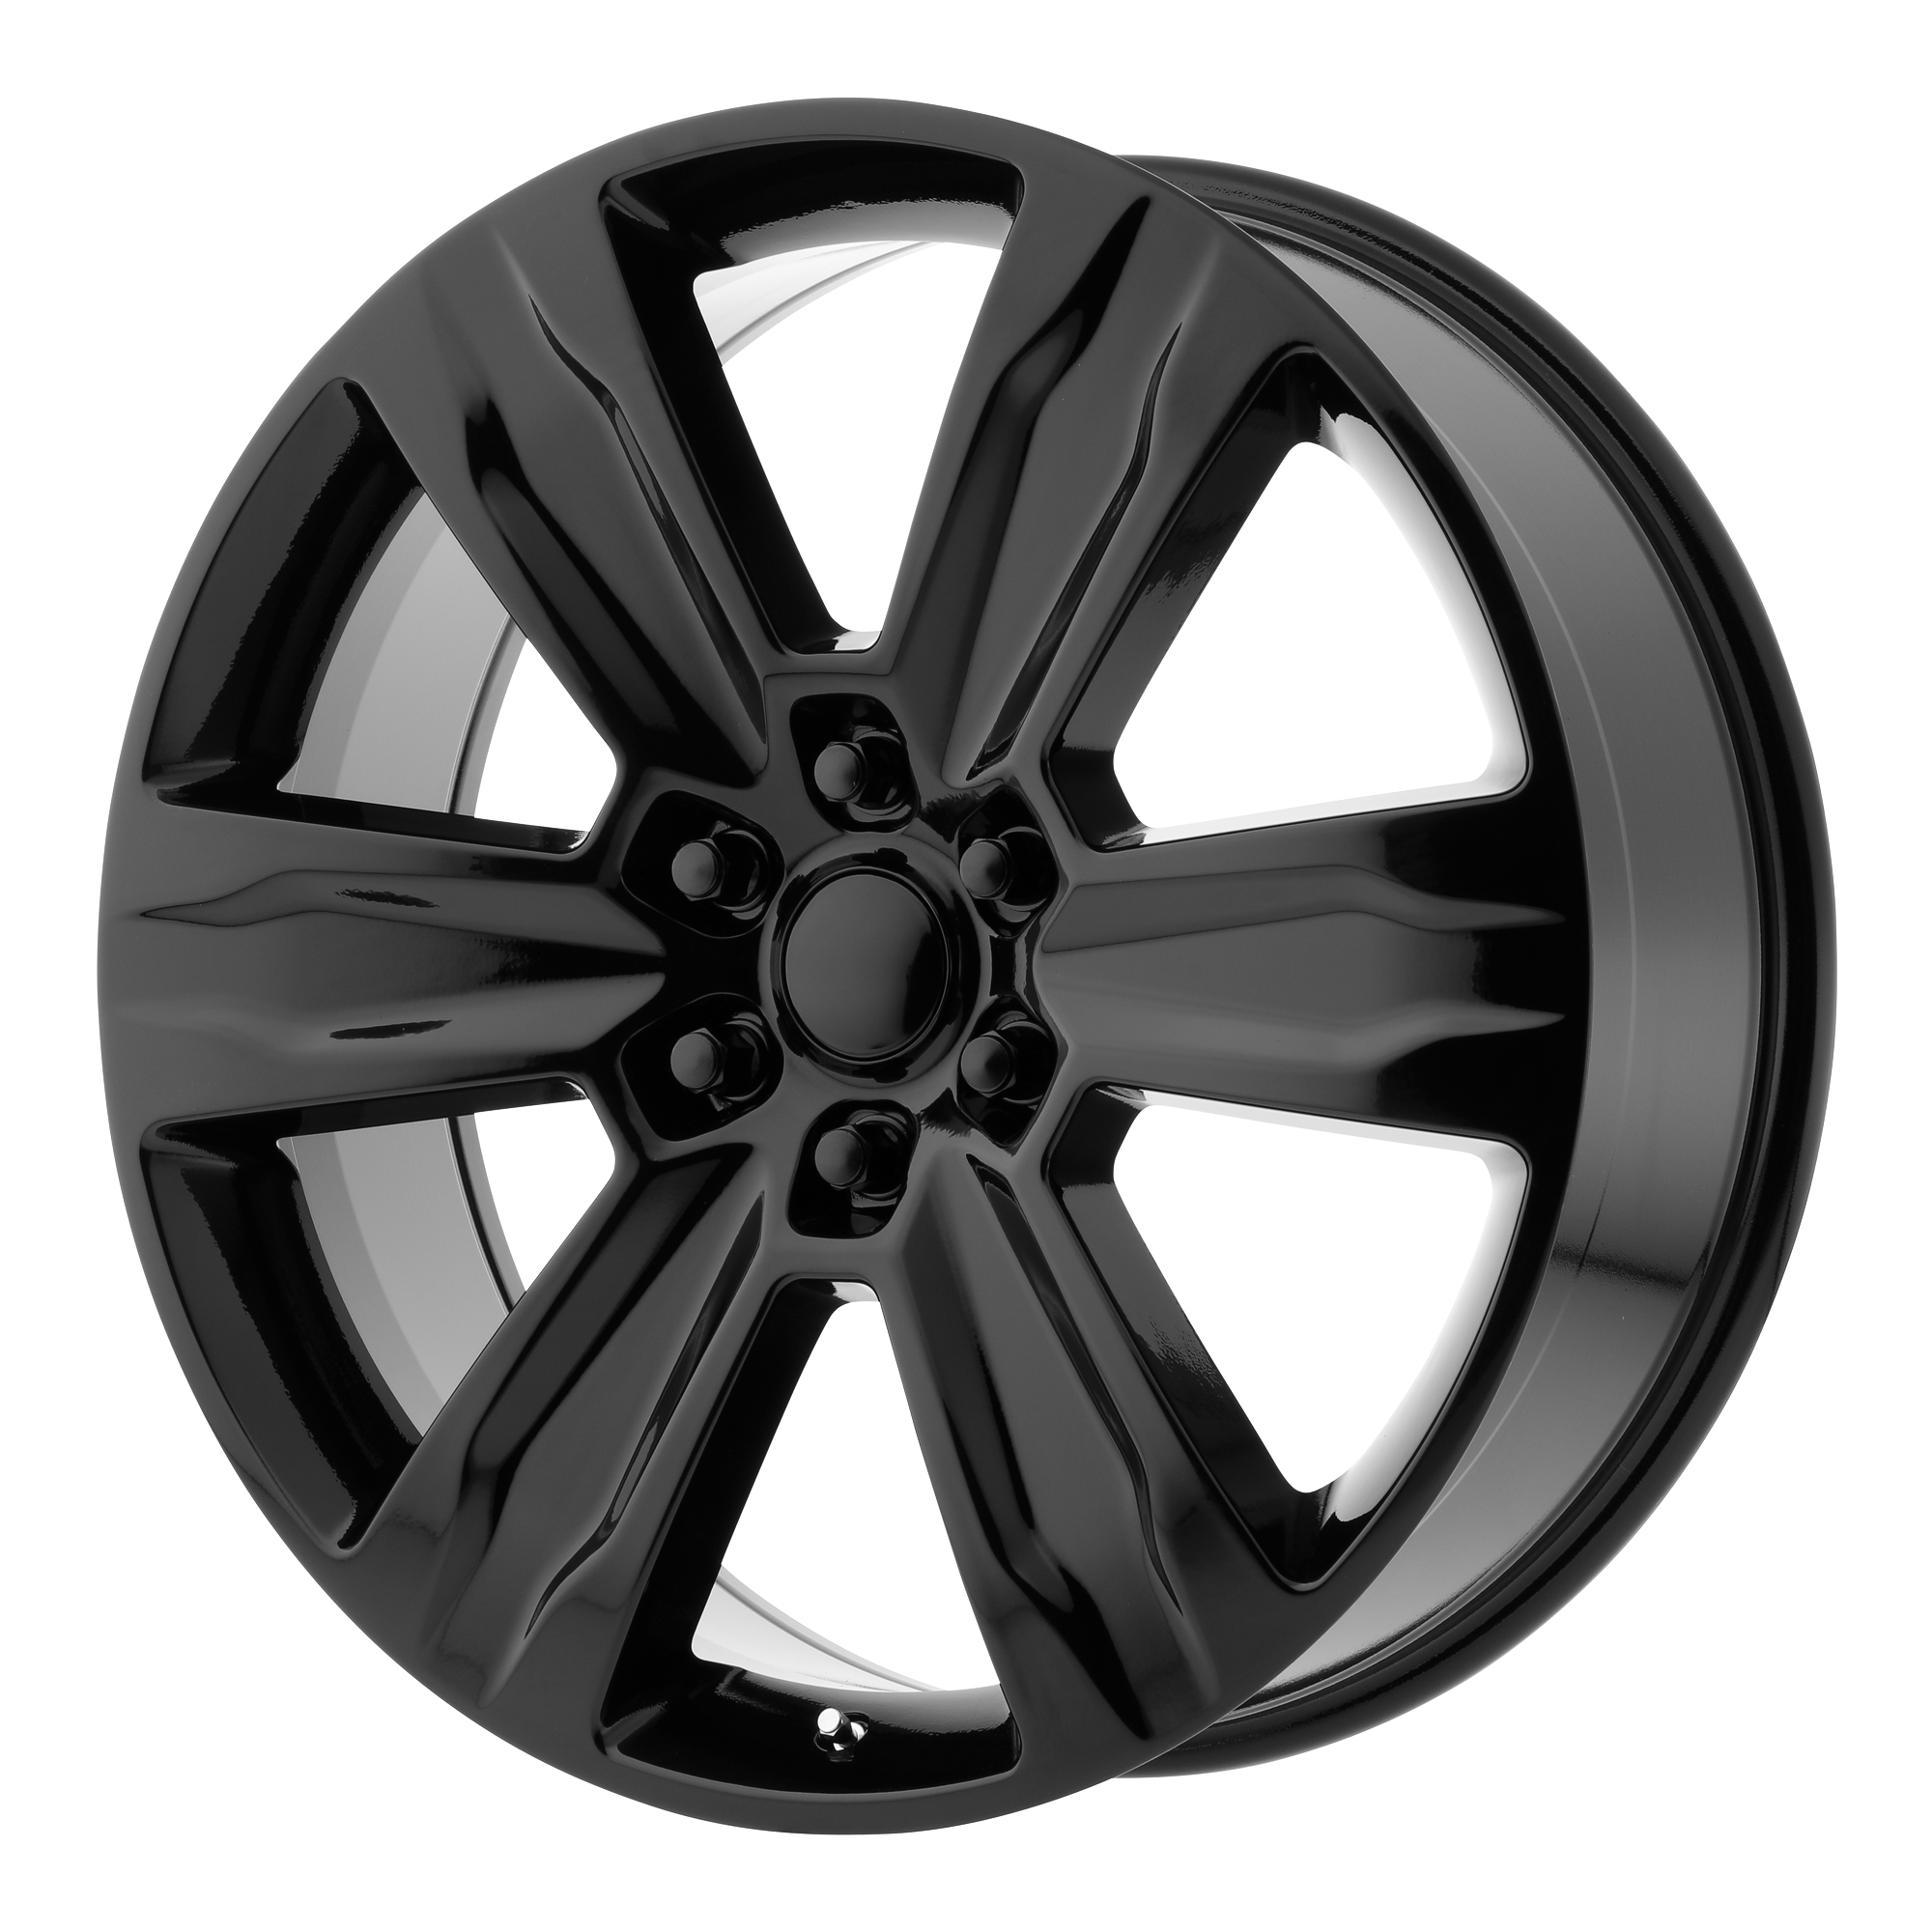 OE Creations Replica Wheels OE Creations PR172 Gloss Black